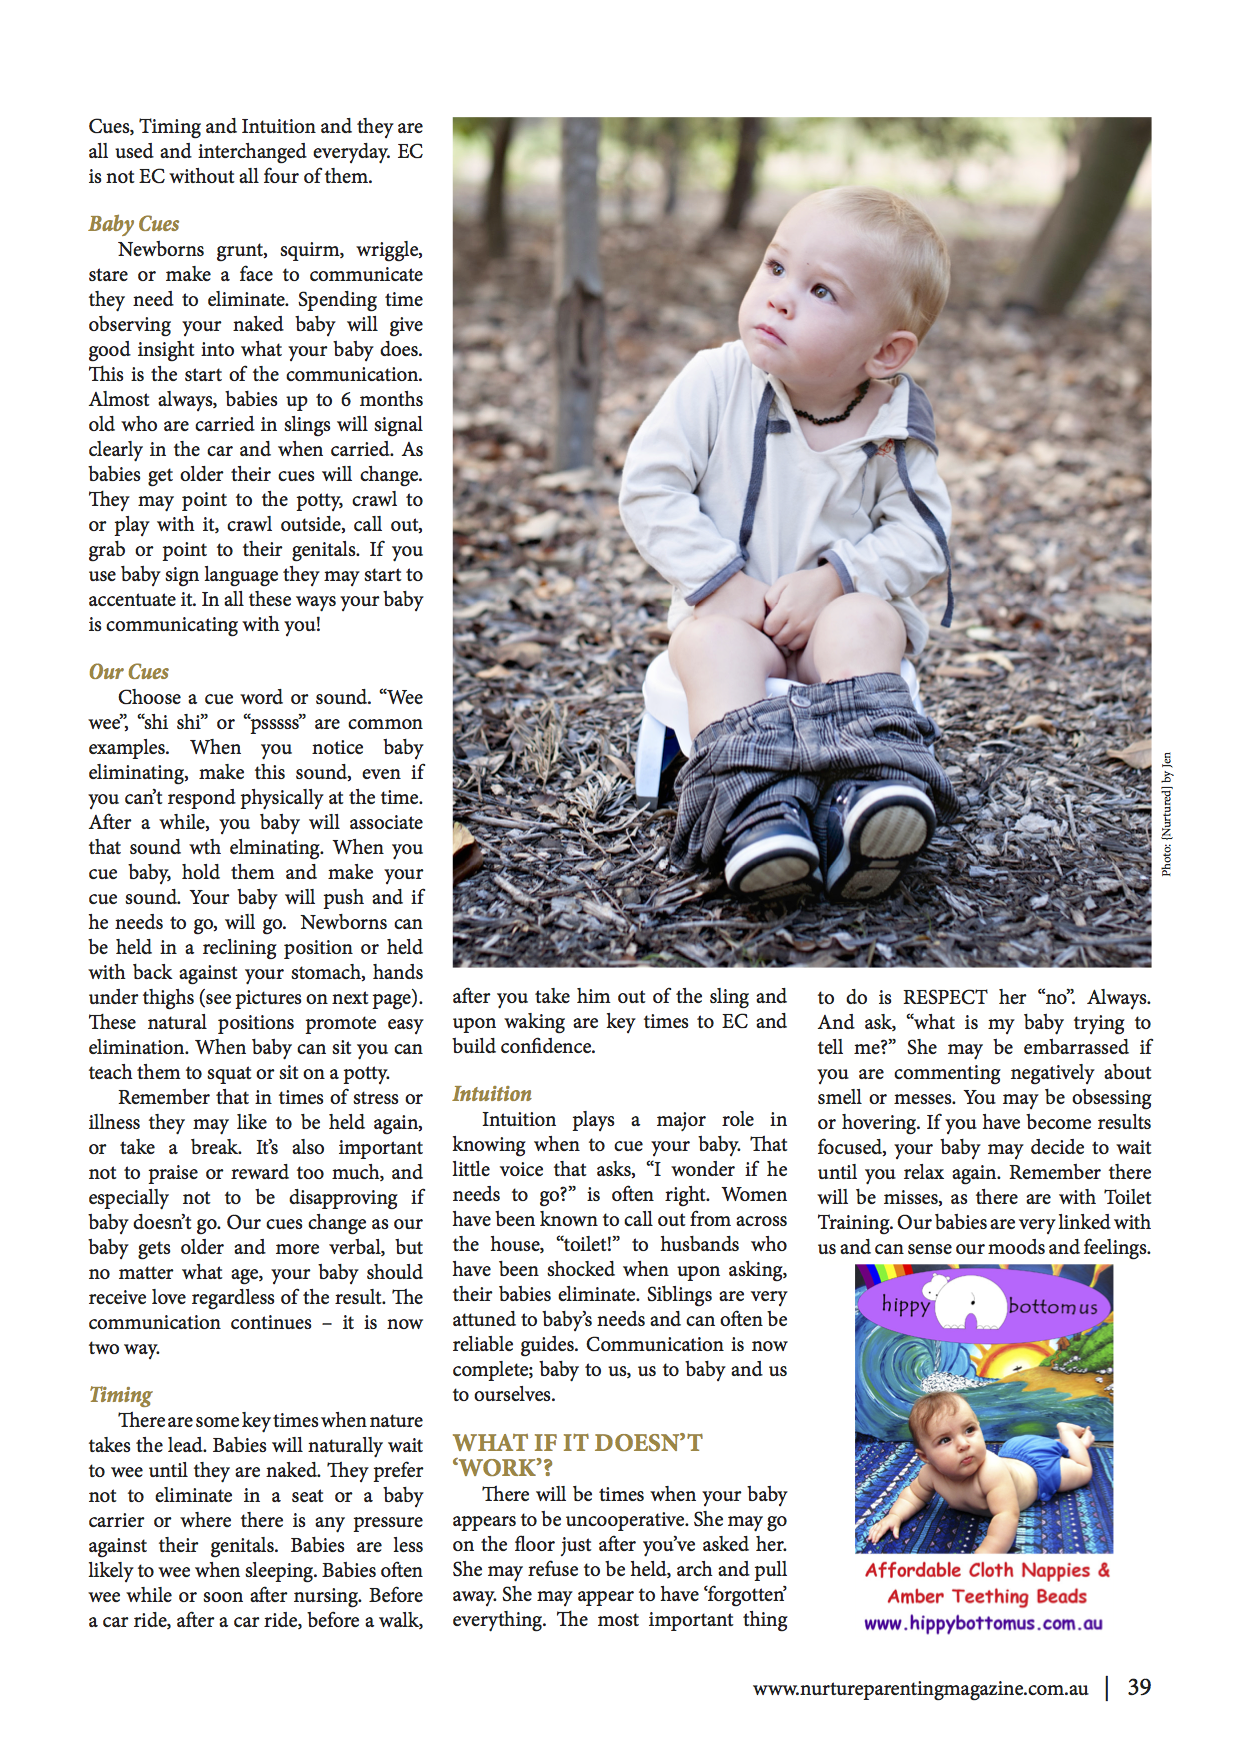 NURTURE Parenting Magazine - Elimination Communication